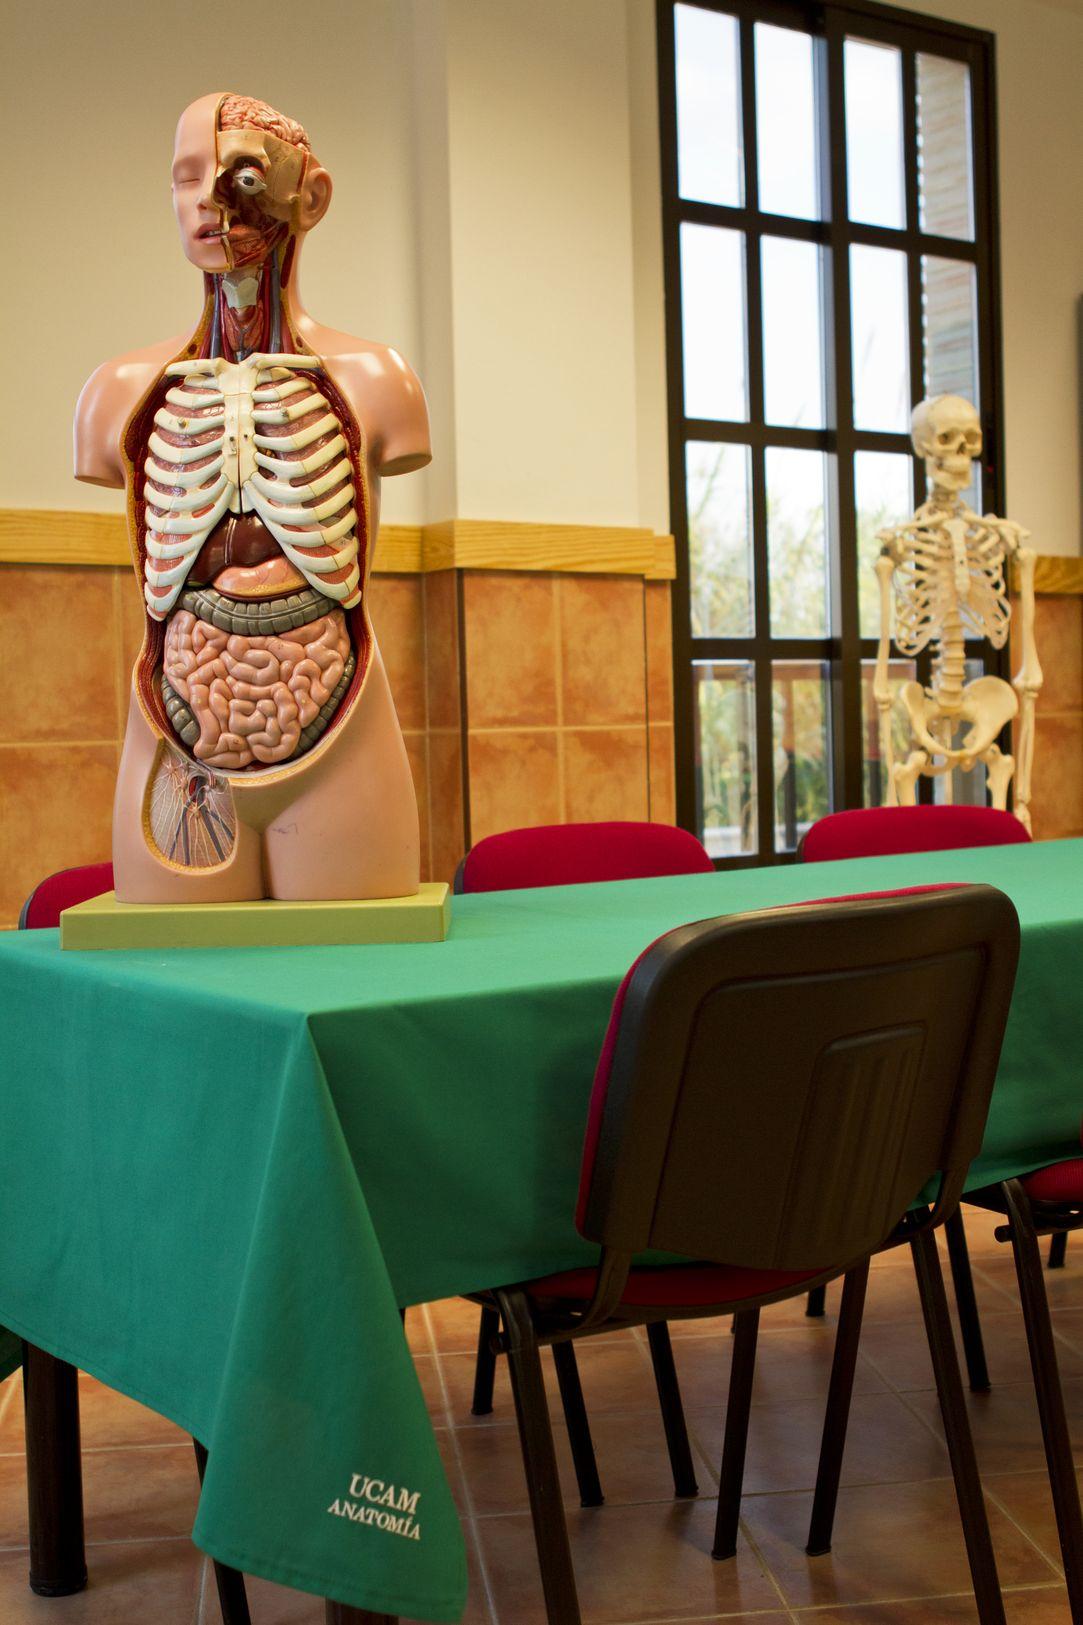 cadaver anatomia_result.jpg